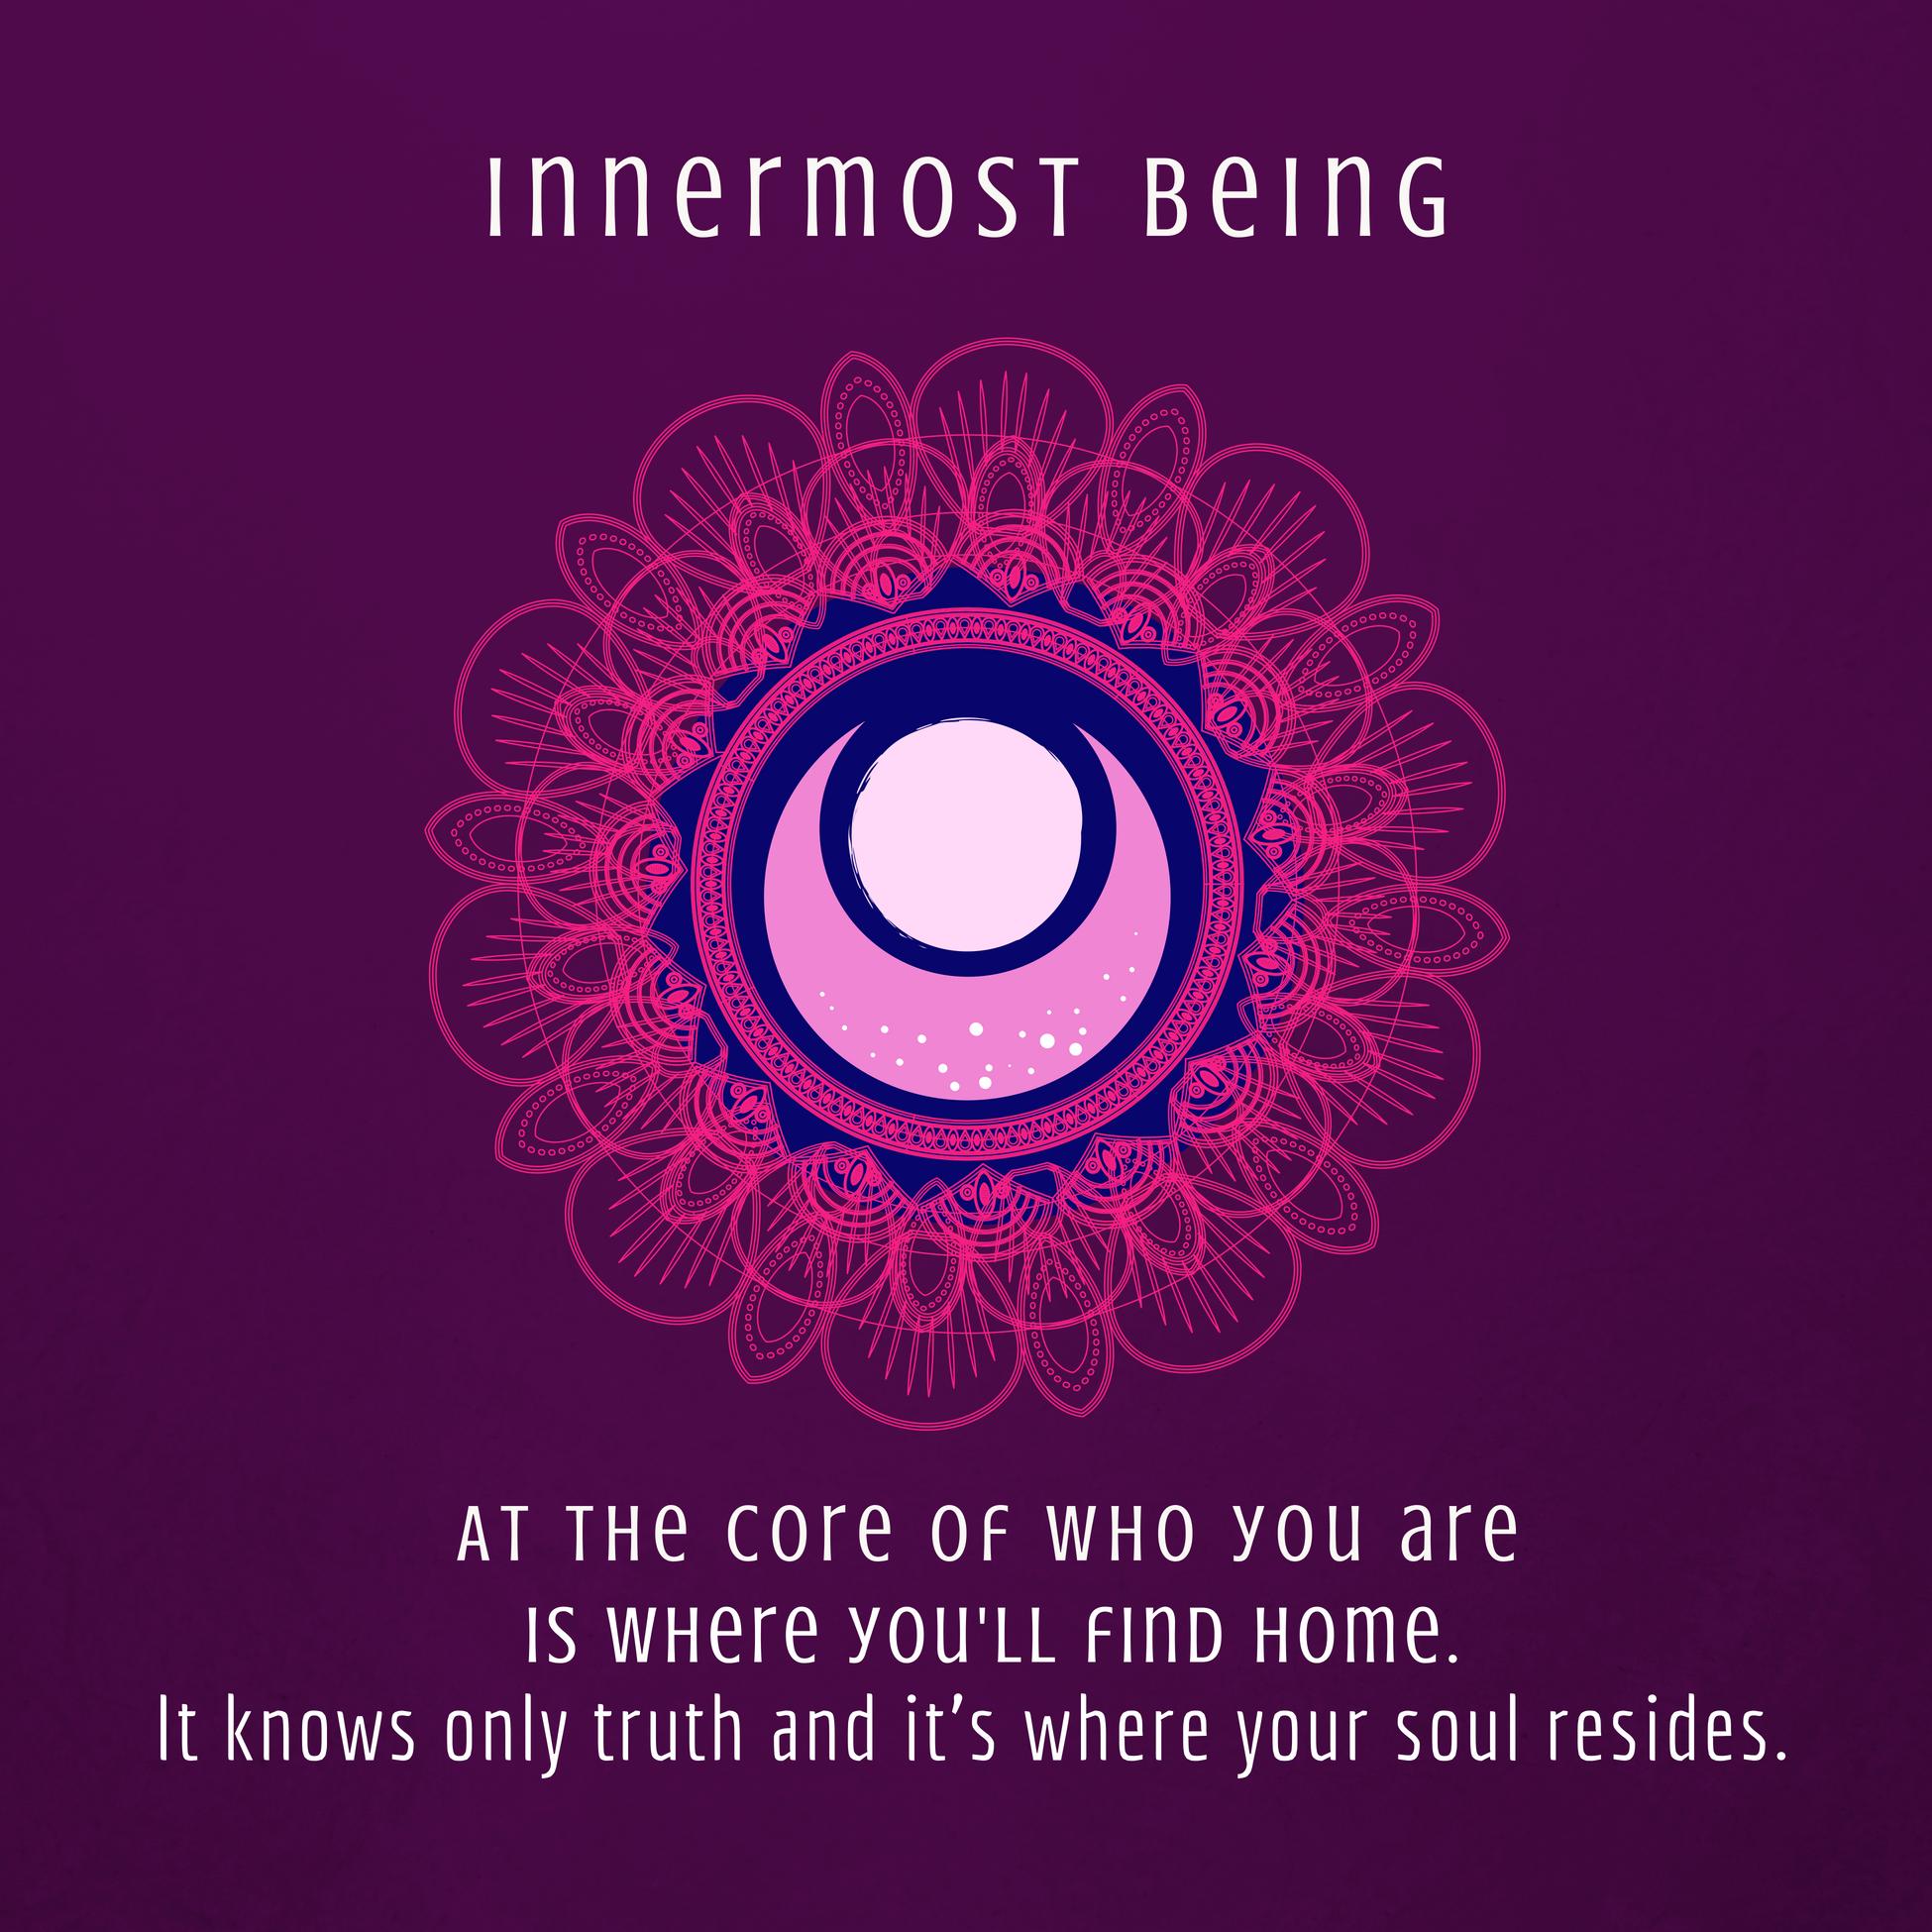 Innermost Being Awaken Soul Practice